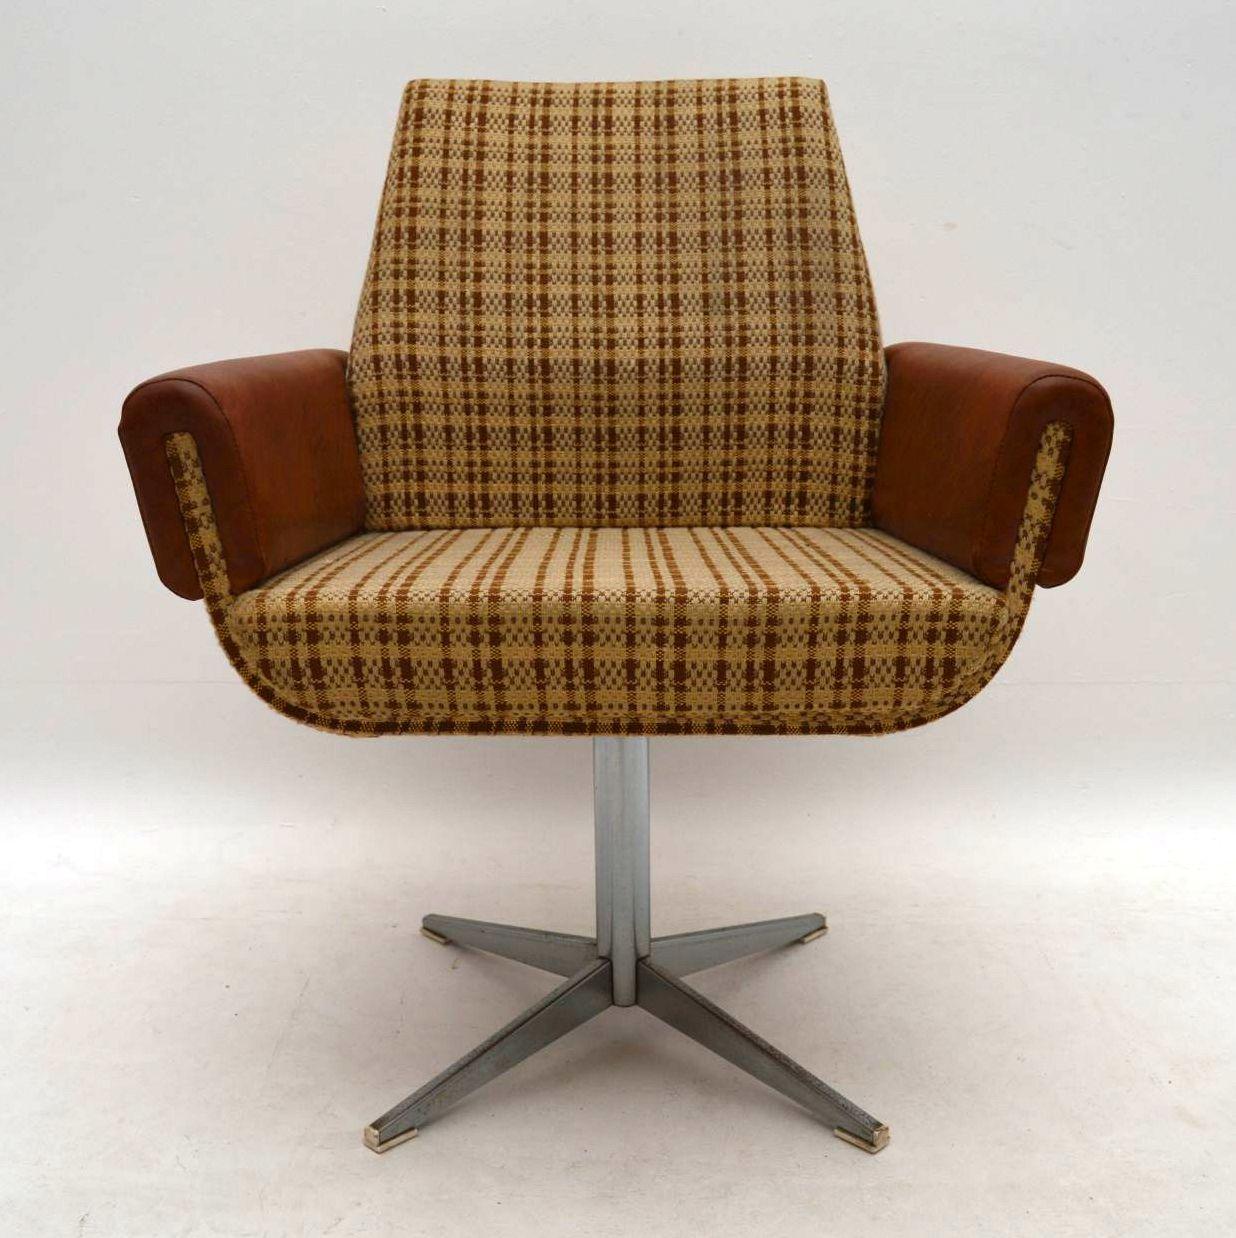 1960's Vintage Swivel Desk Chair